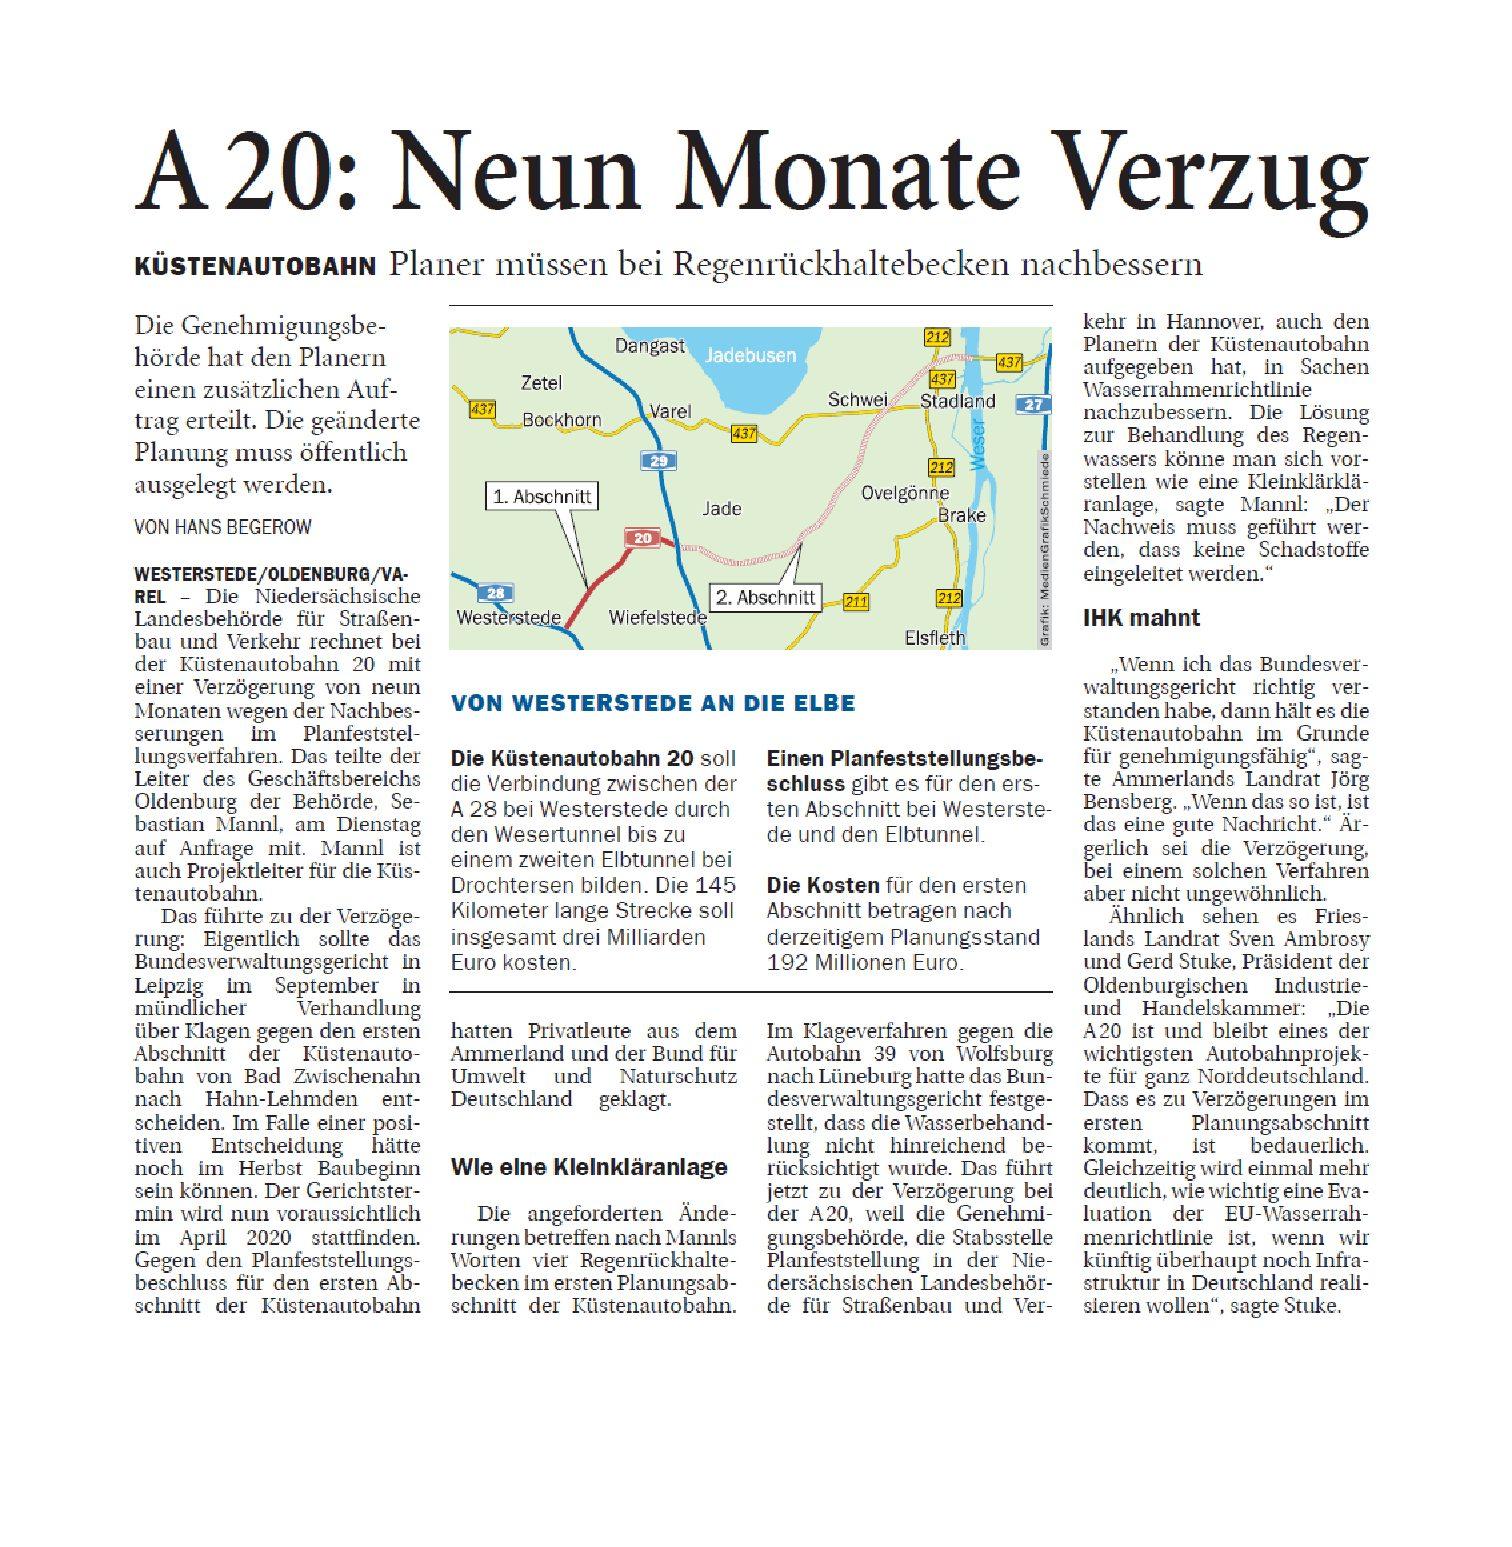 Jeversches Wochenblatt 21.08.2019 III